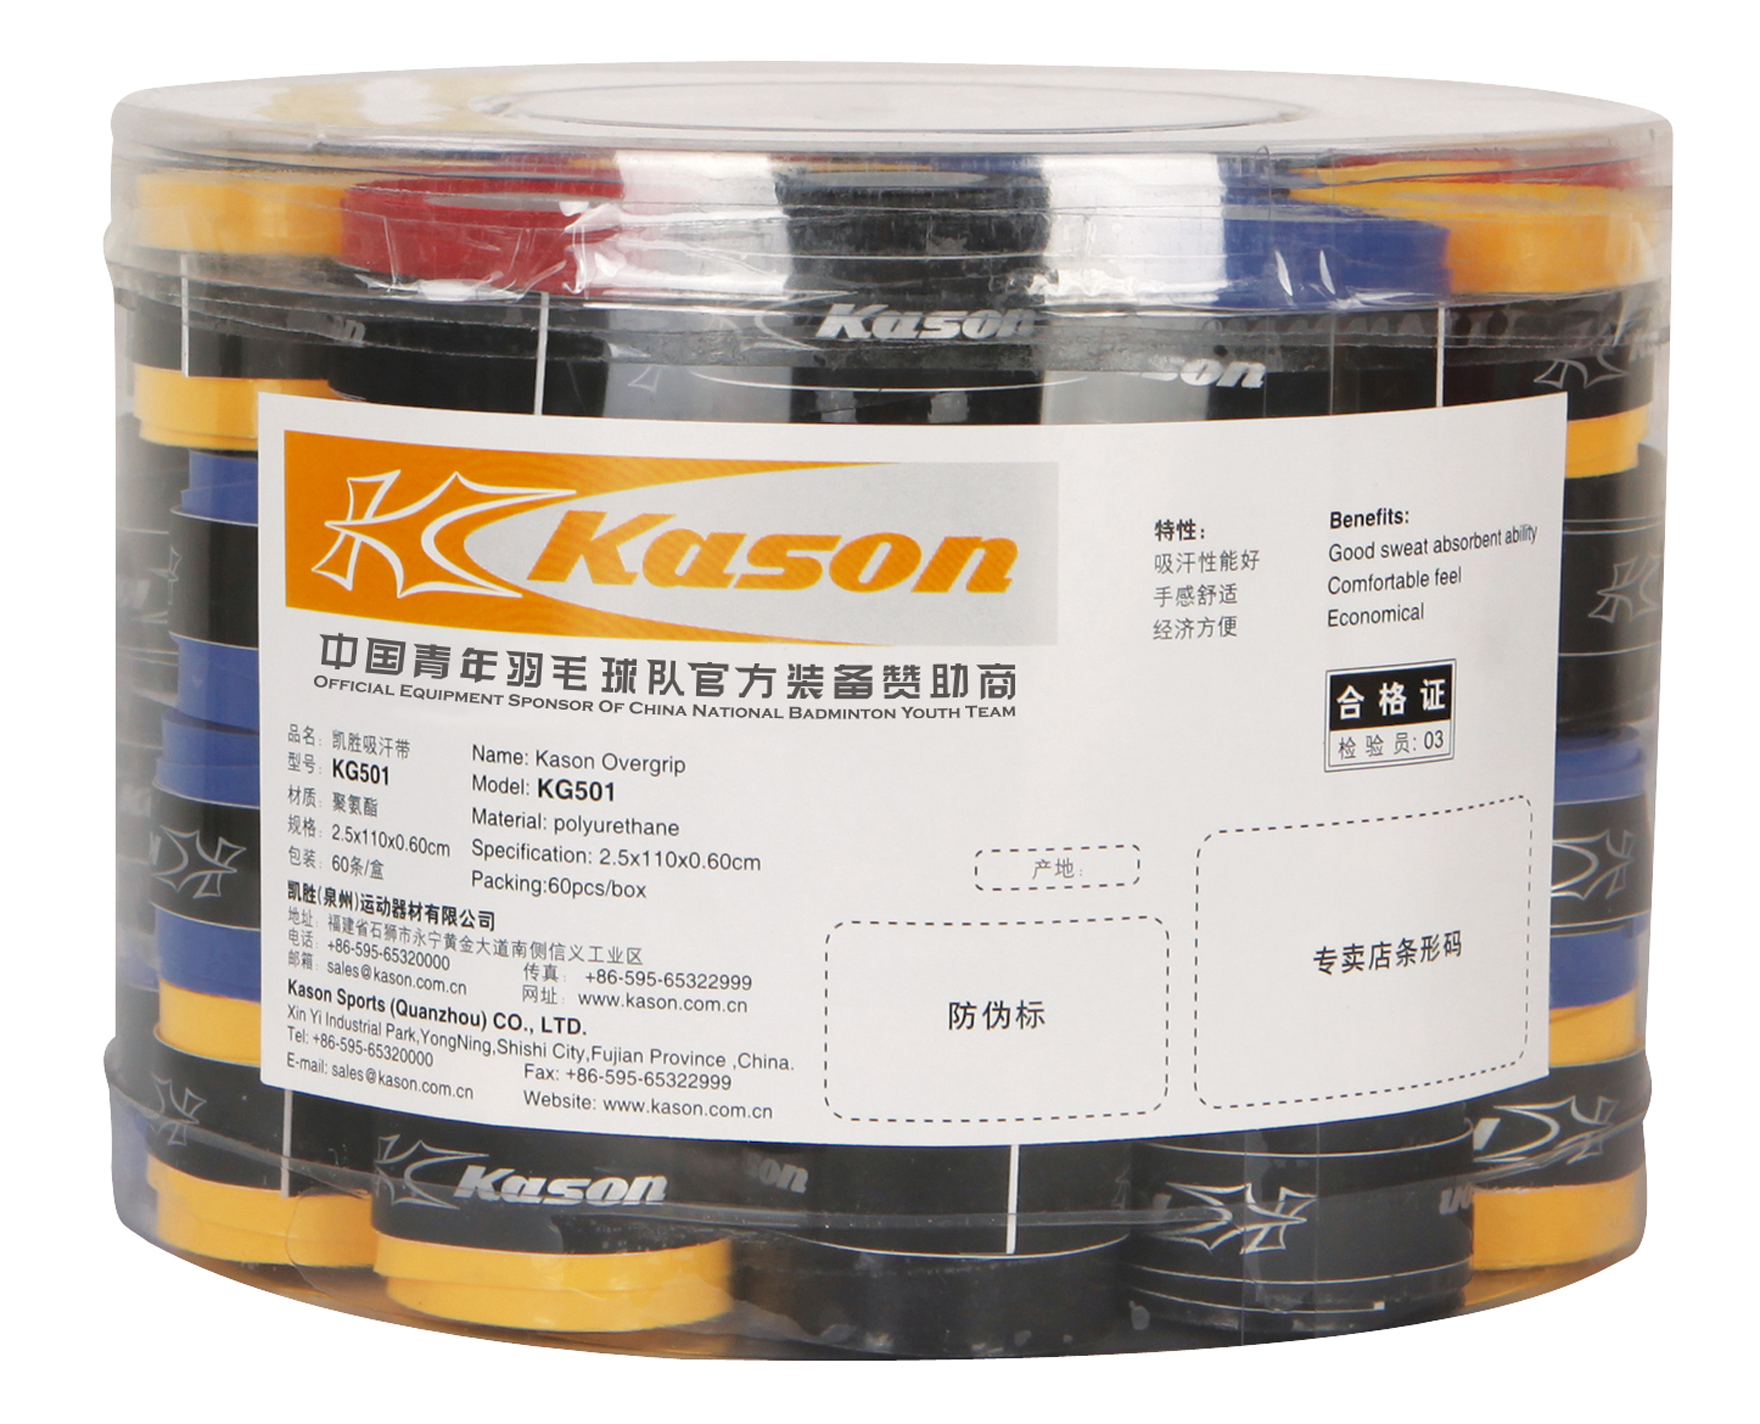 70ed40765 Kason | Badminton Grip Tape | KG501 Overgrip FXJD010-1